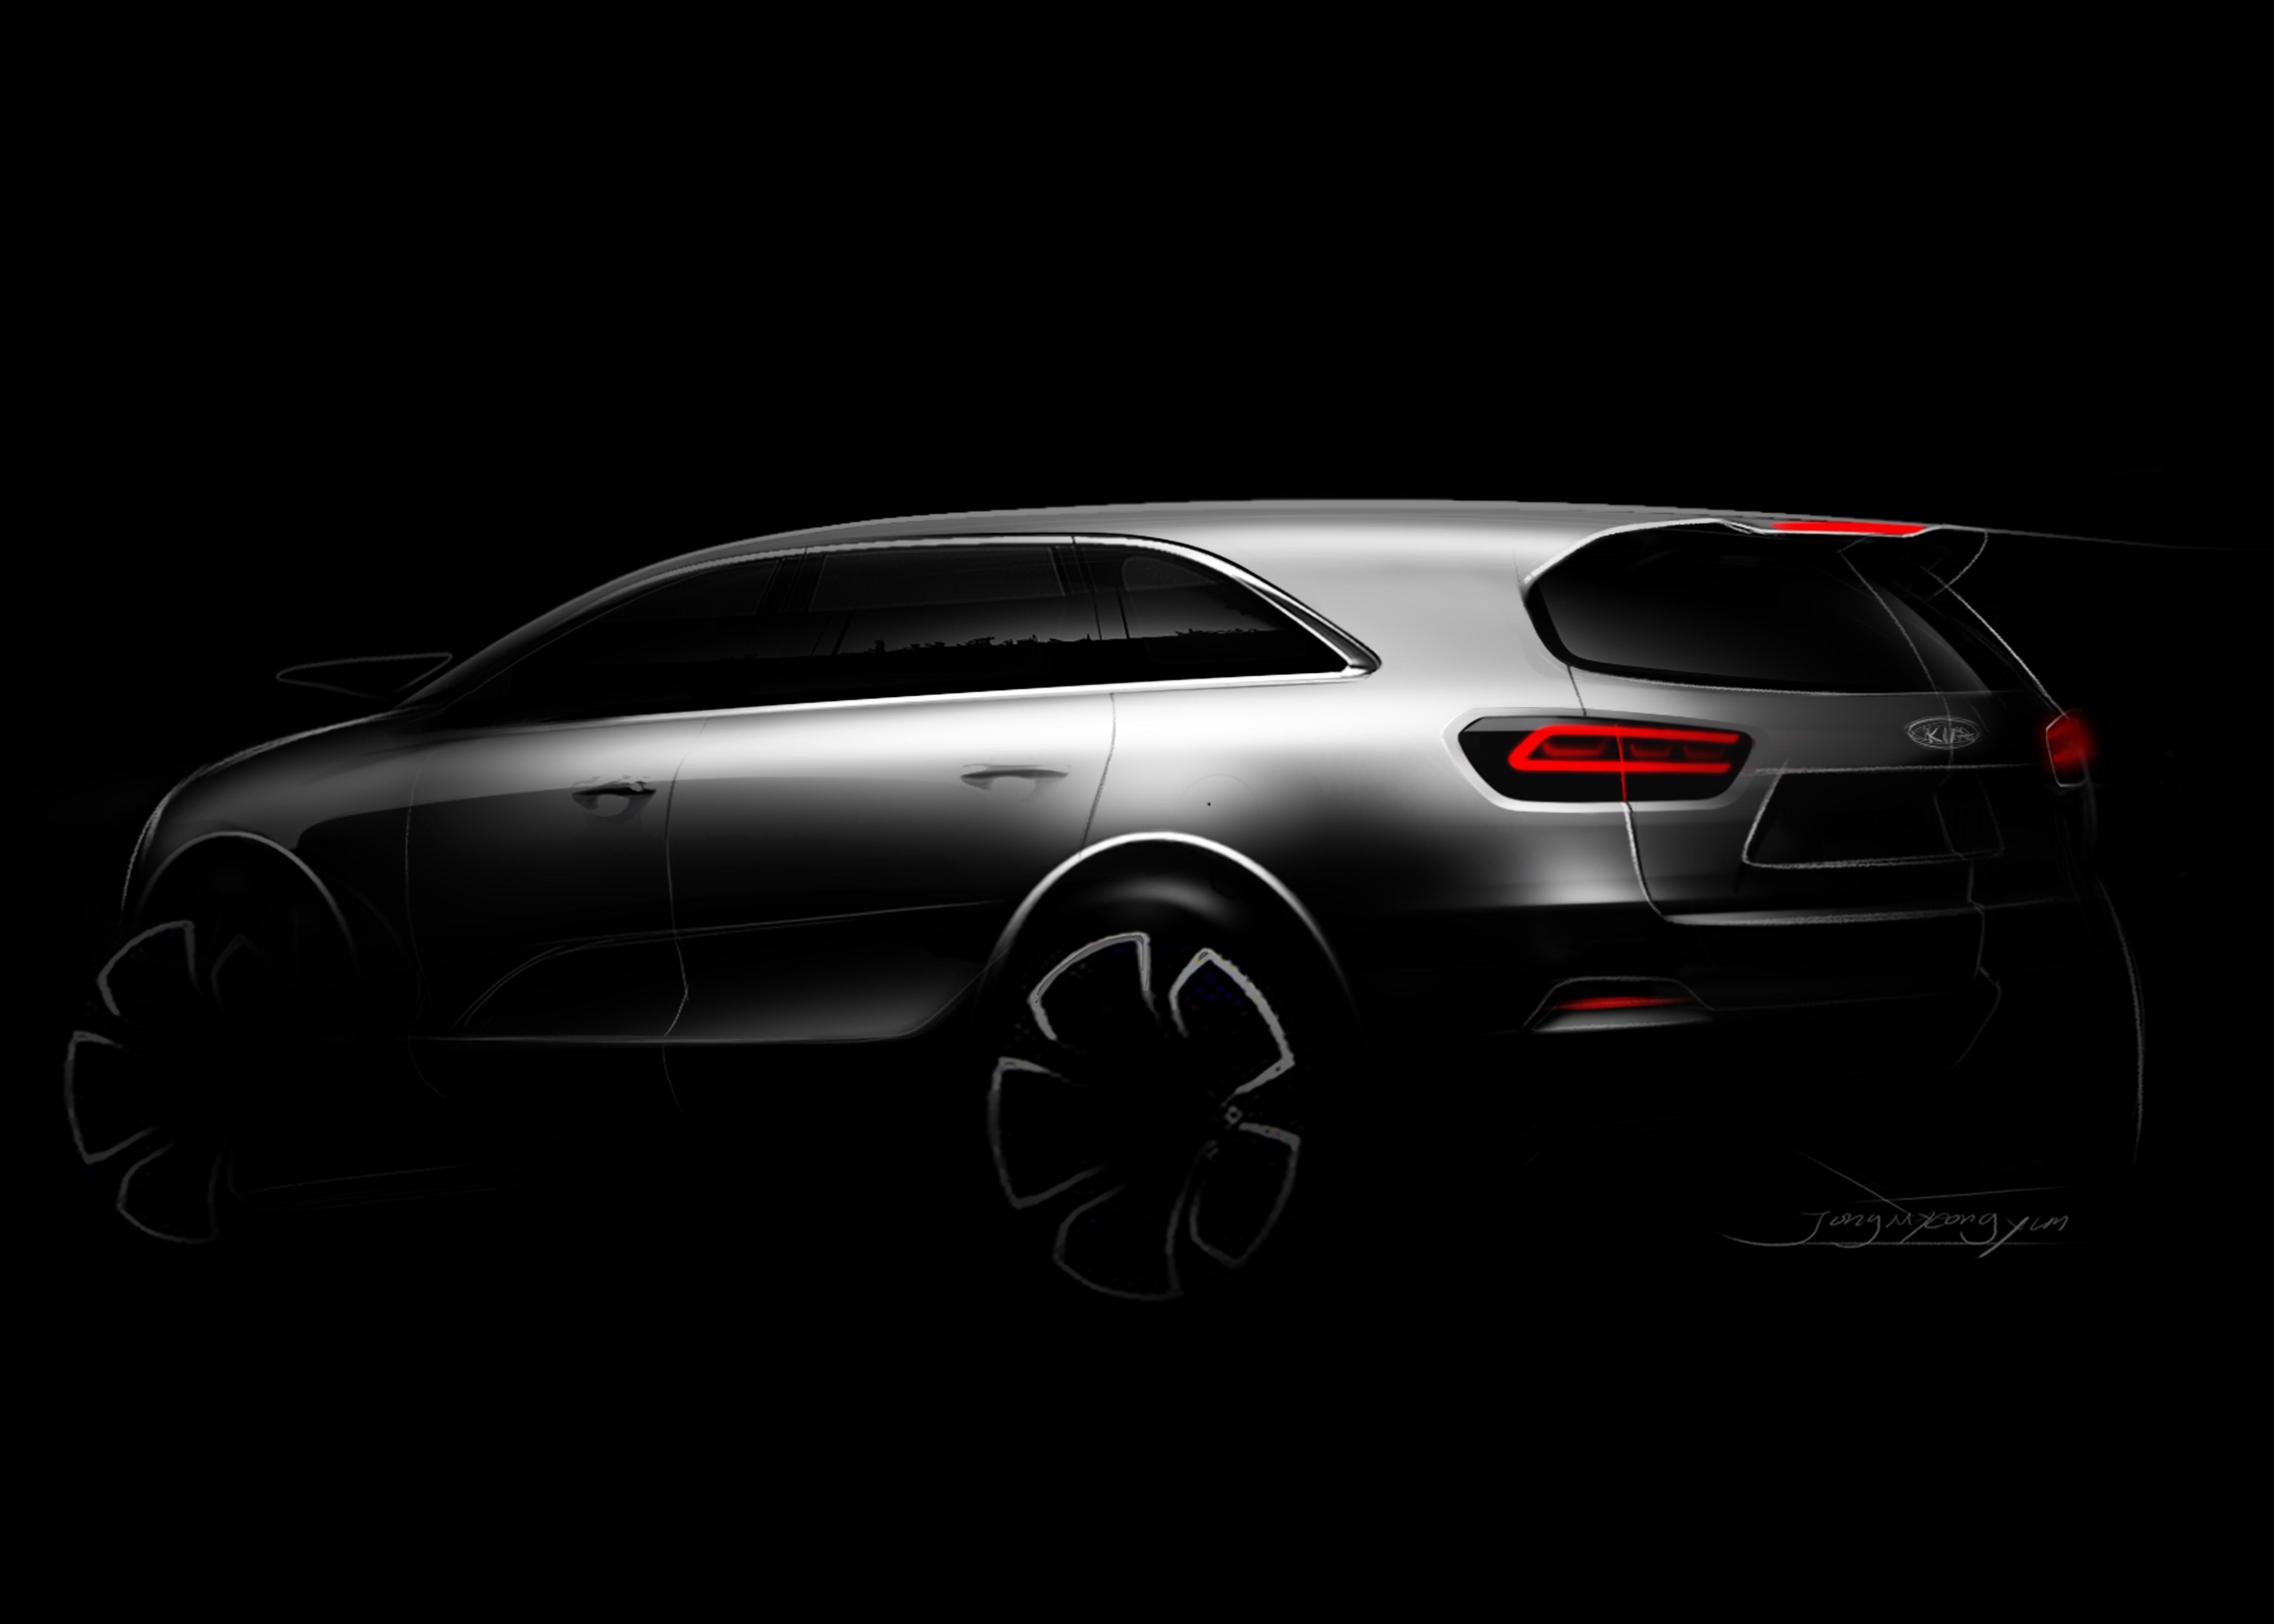 Kia Stinger Gt >> Neuer Kia Sorento mit kraftvoll-elegantem Design - Kia Press Schweiz